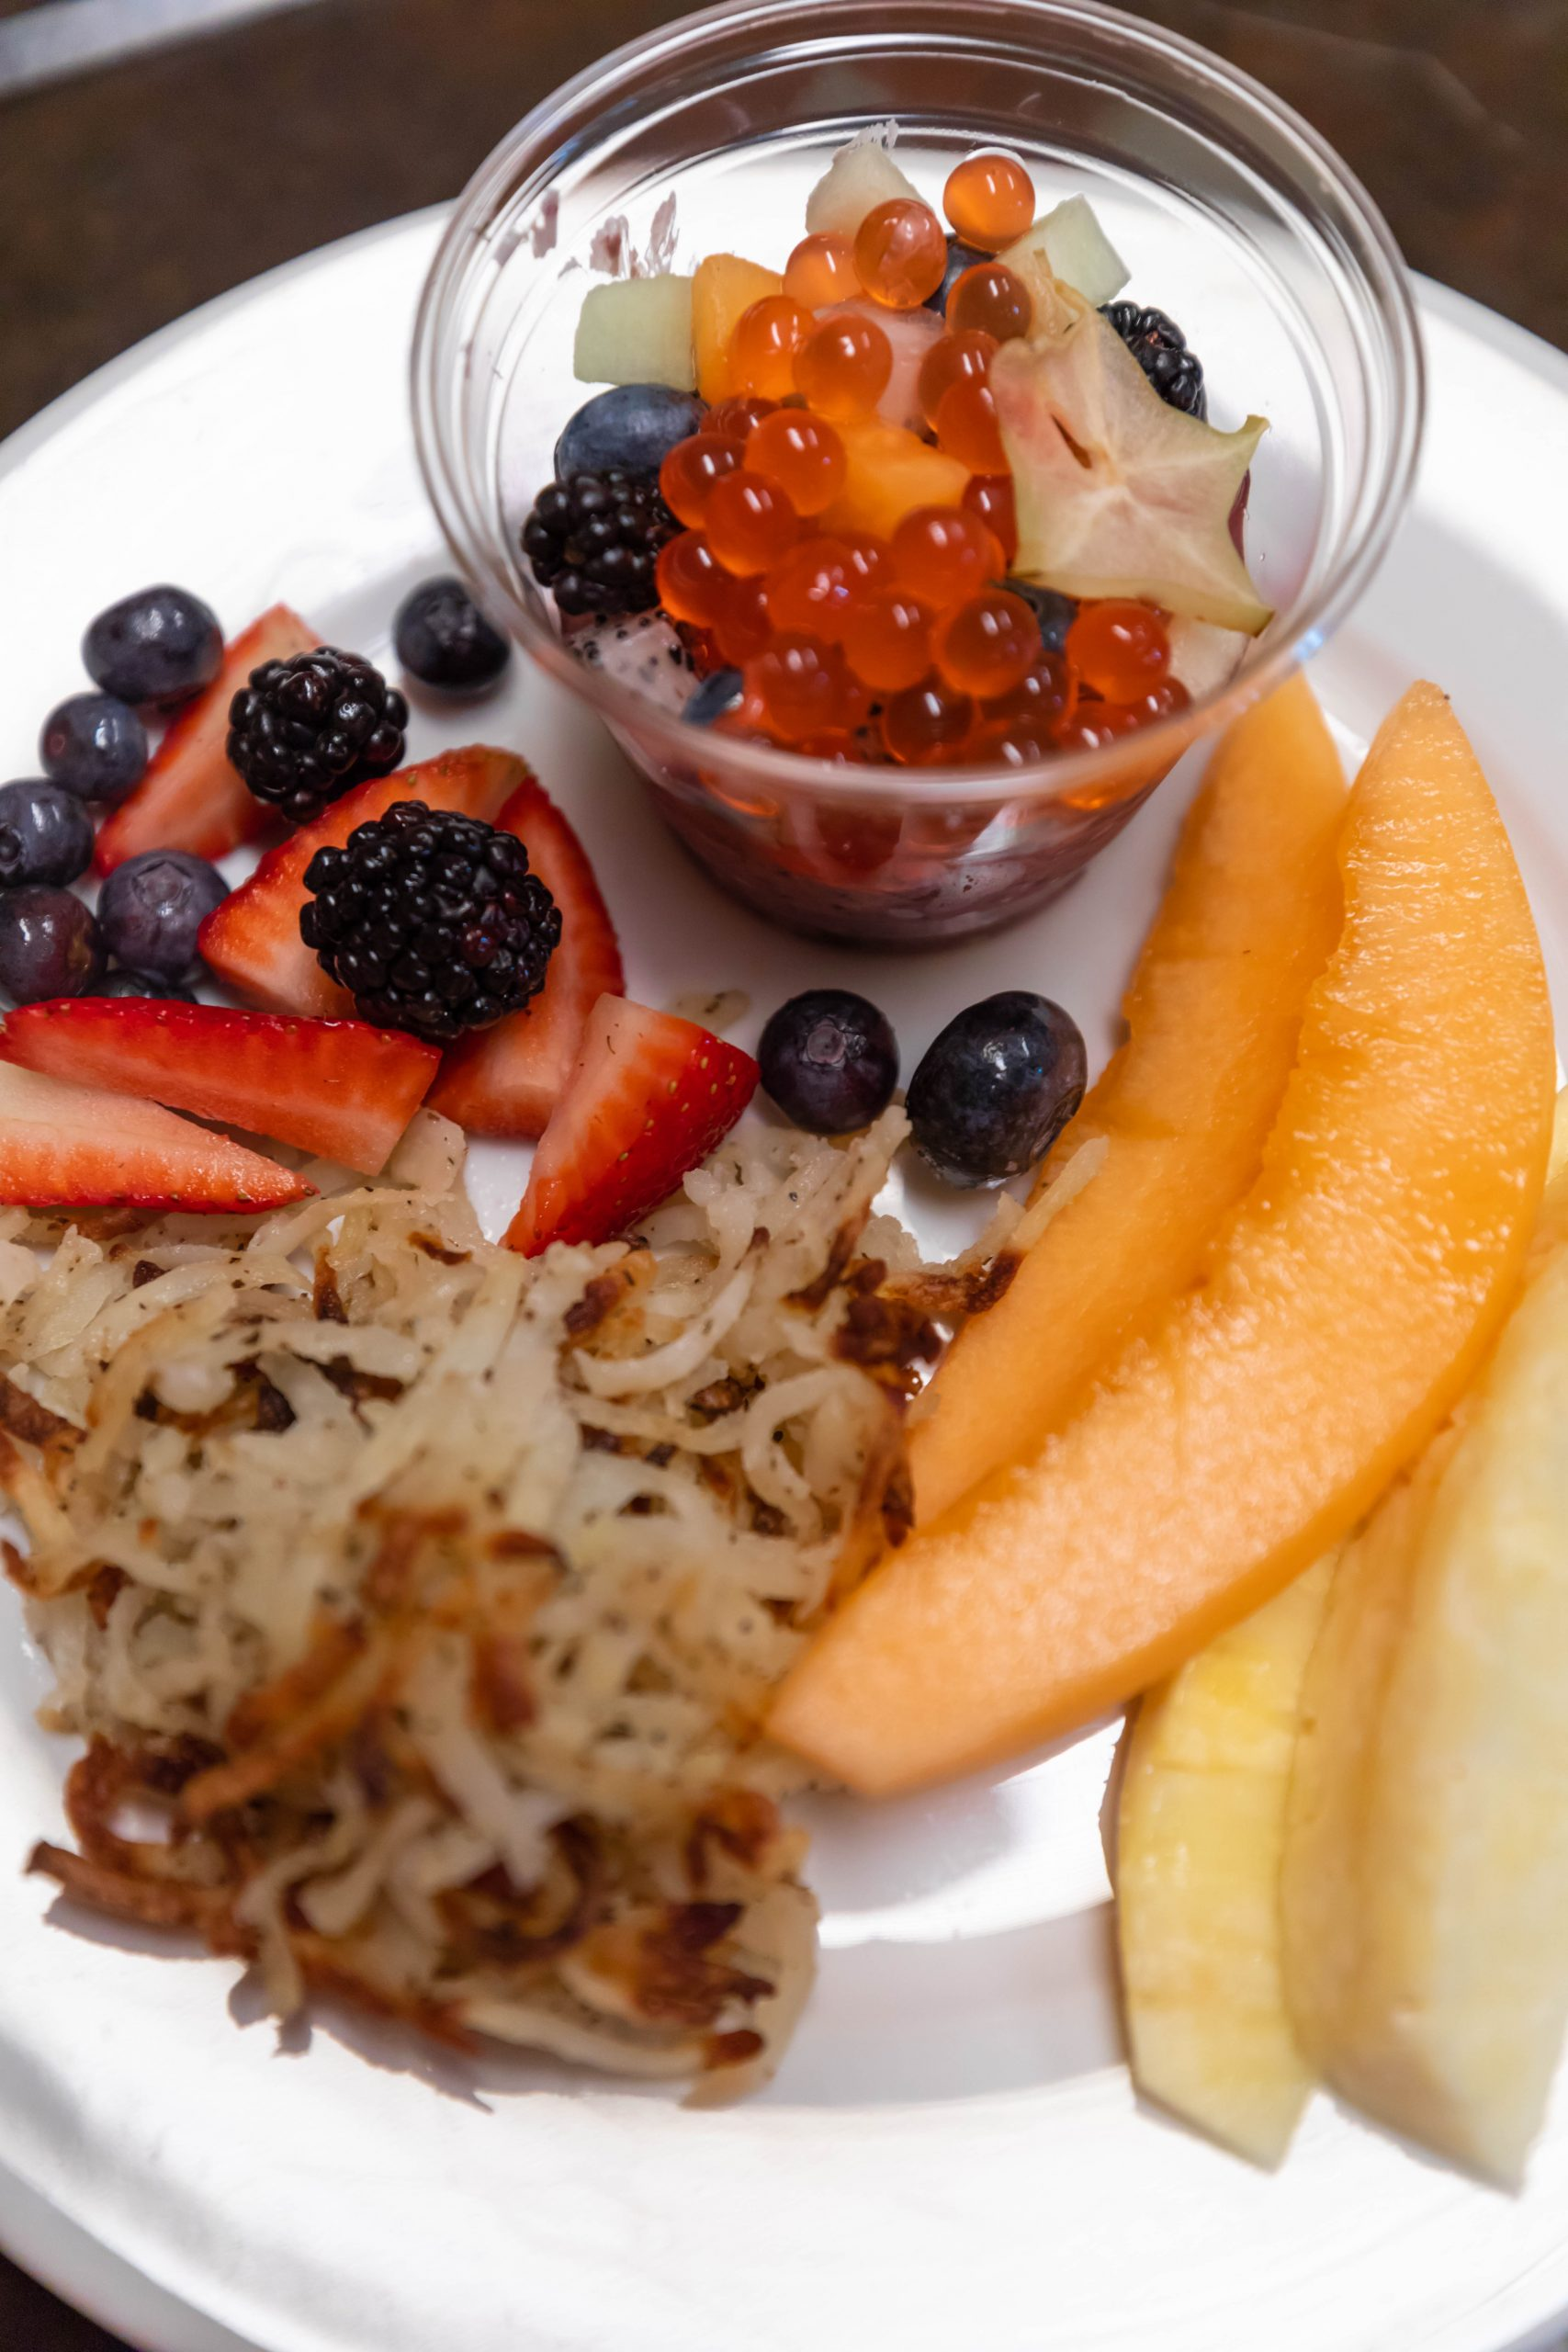 Docking Bay 7 Food & Cargo Breakfast During Private Tour of Galaxy's Edge Hollywood Studio Walt Disney World Annie Fairfax